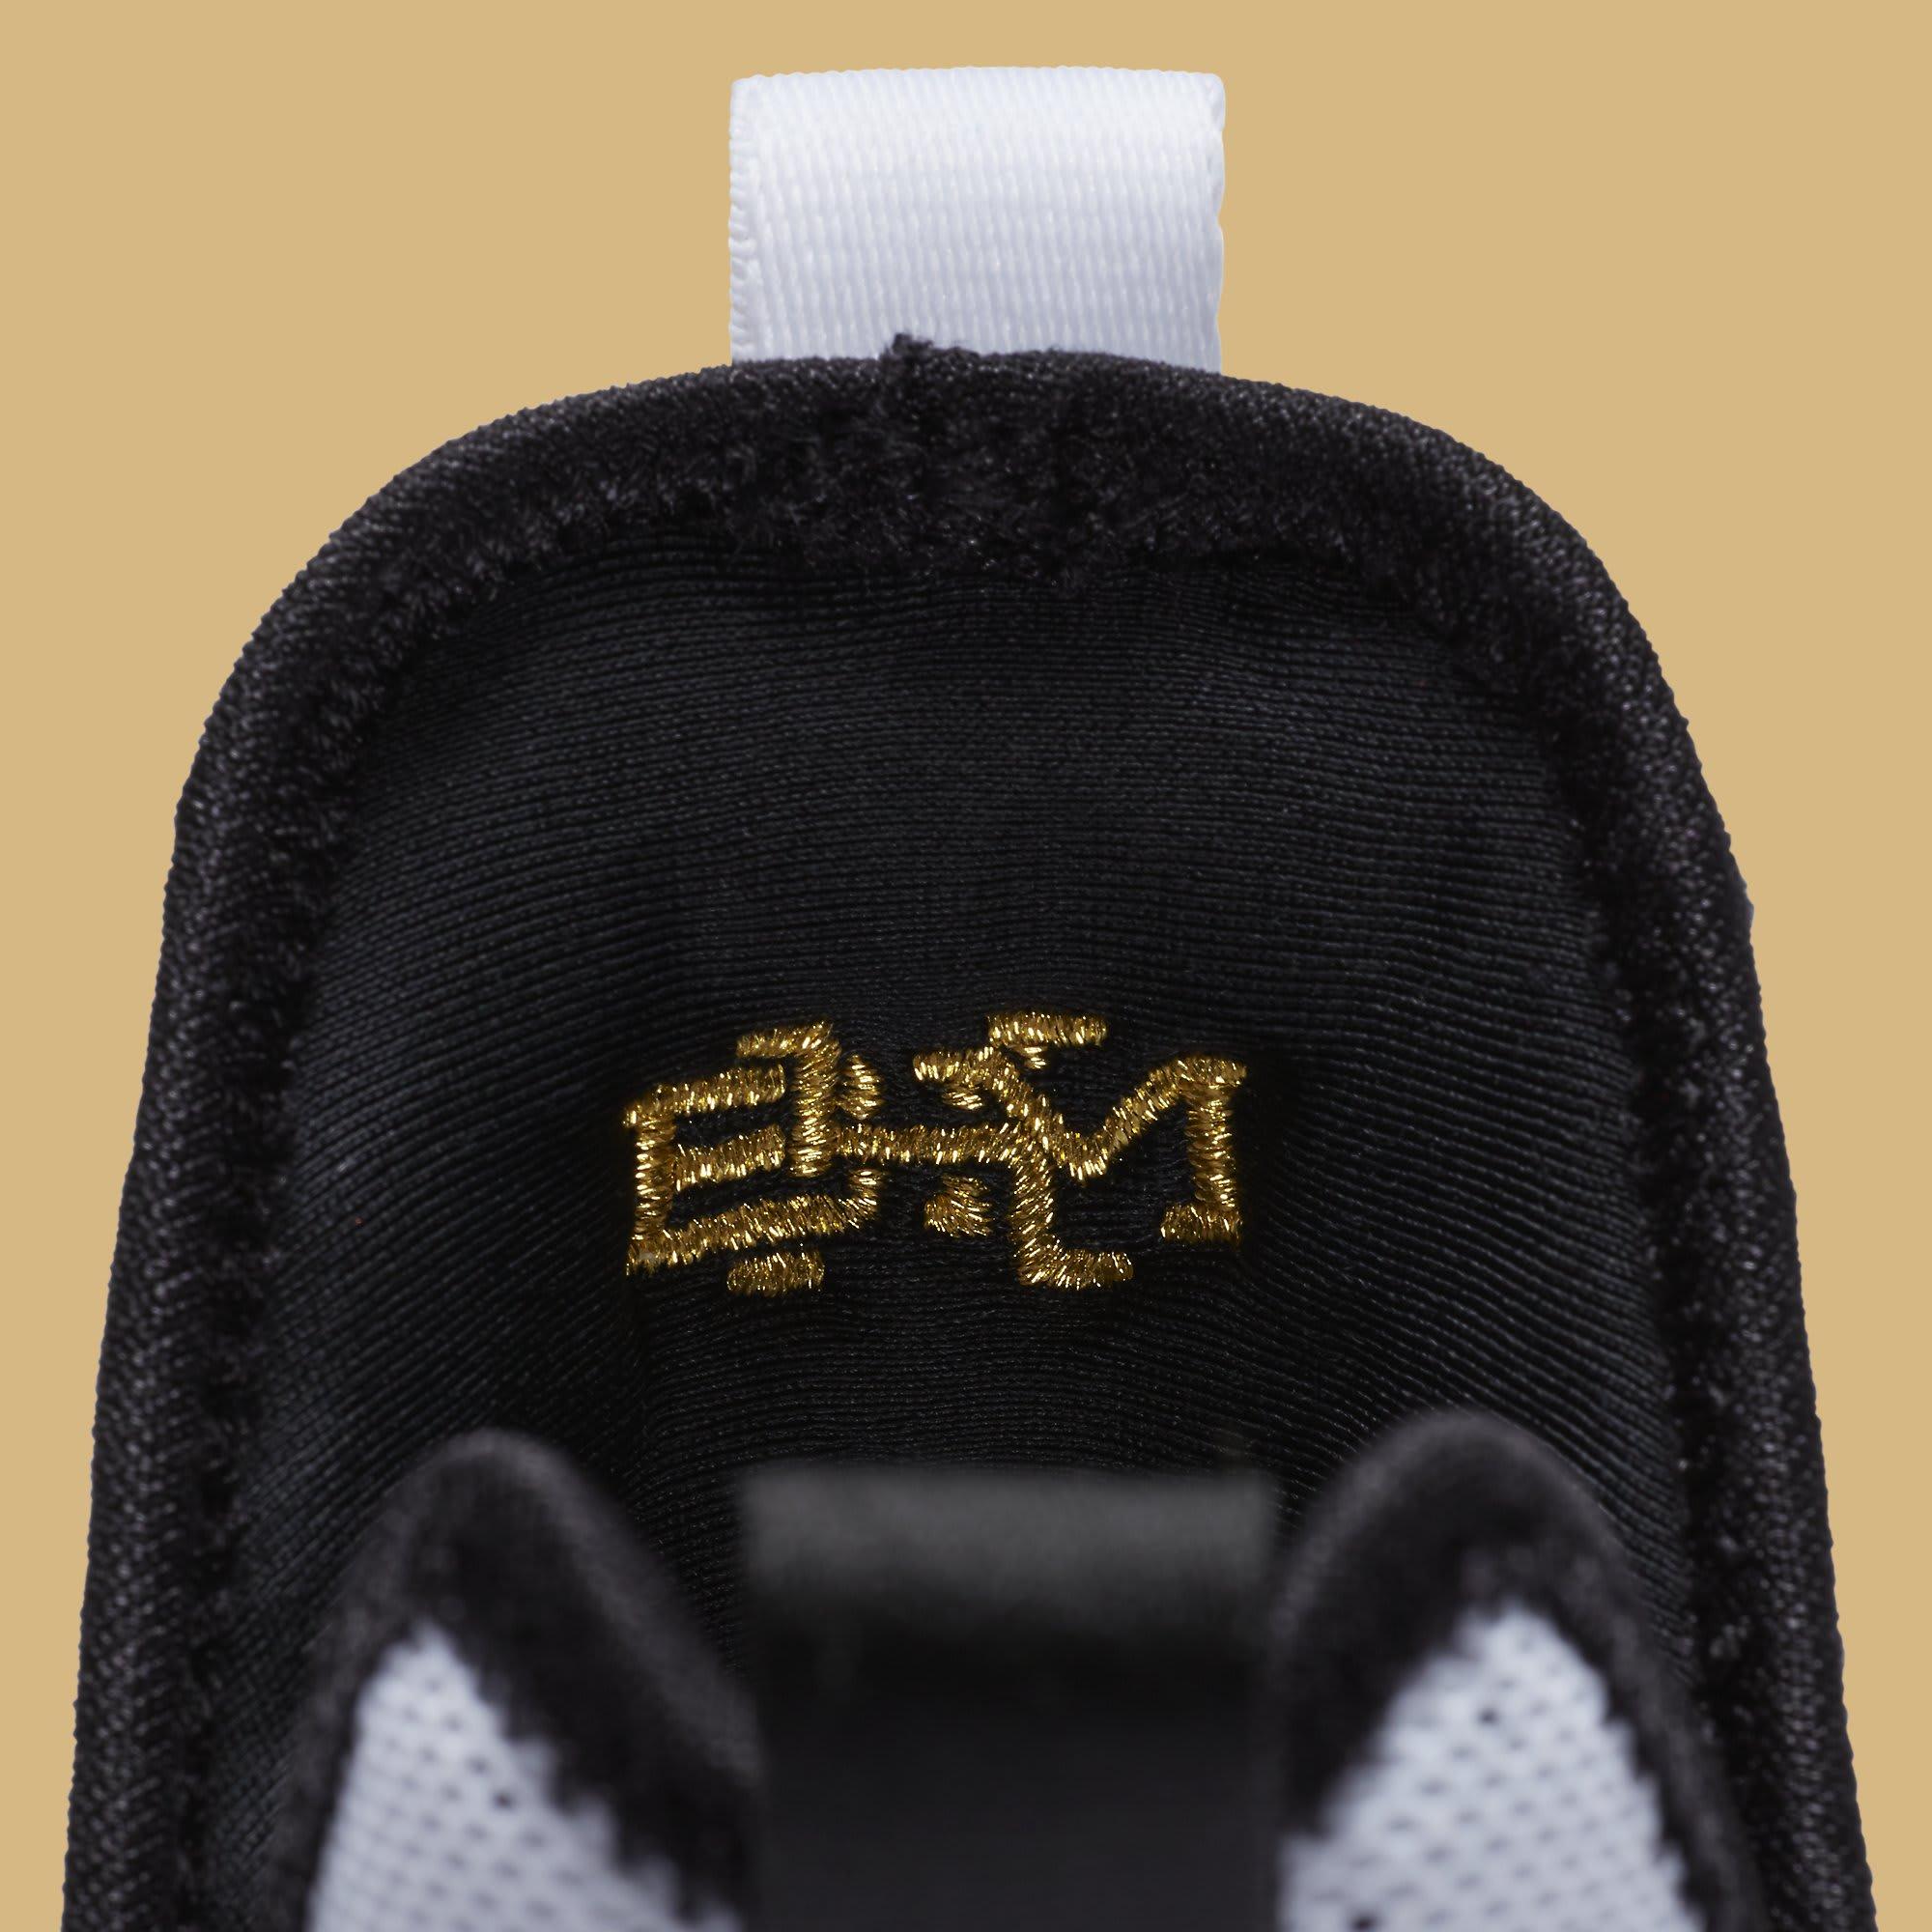 Nike LeBron 14 BHM Release Date Tongue 860634-100